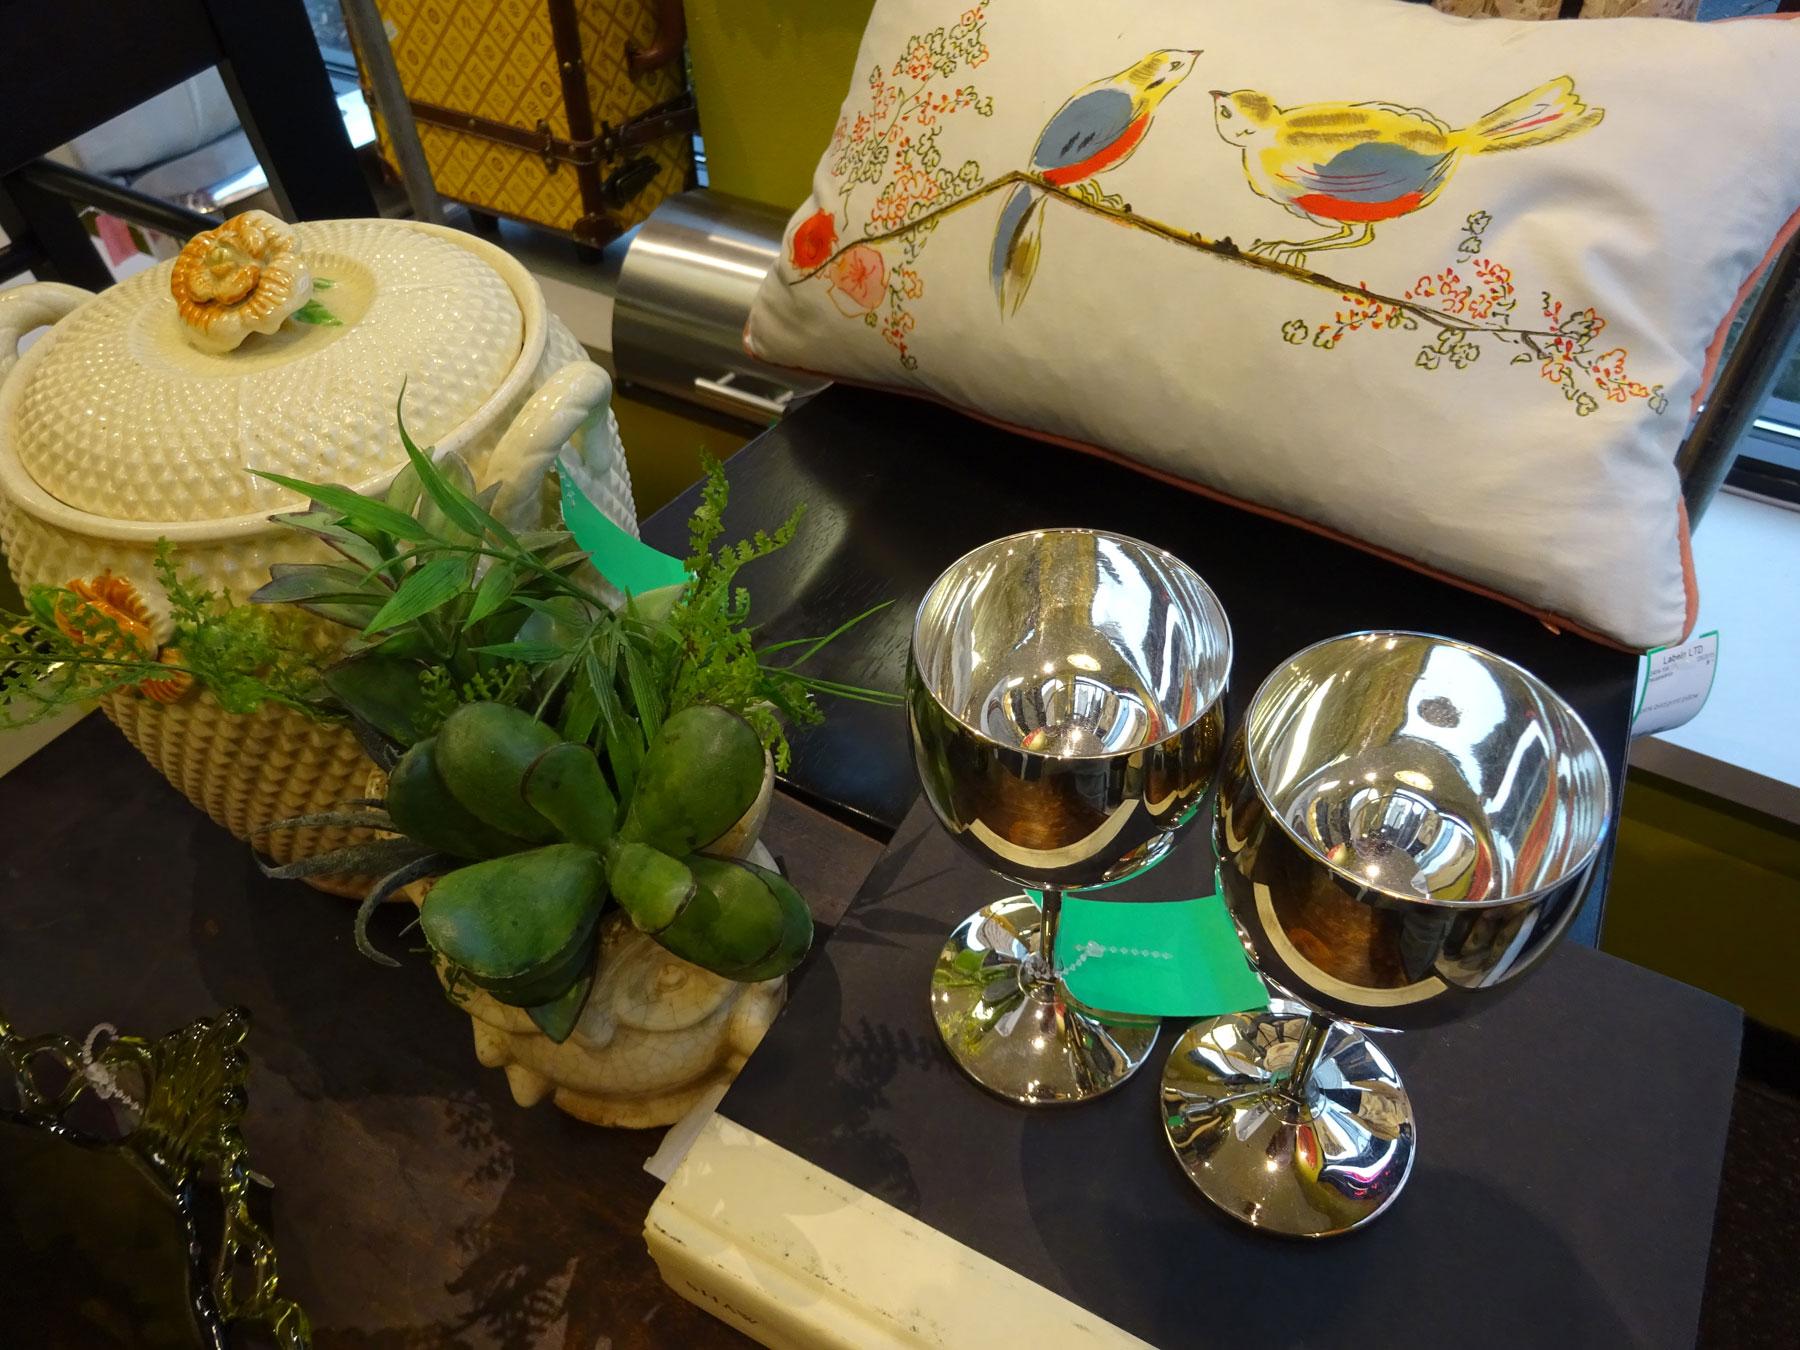 DSC00858-silver-goblets-1800x1350